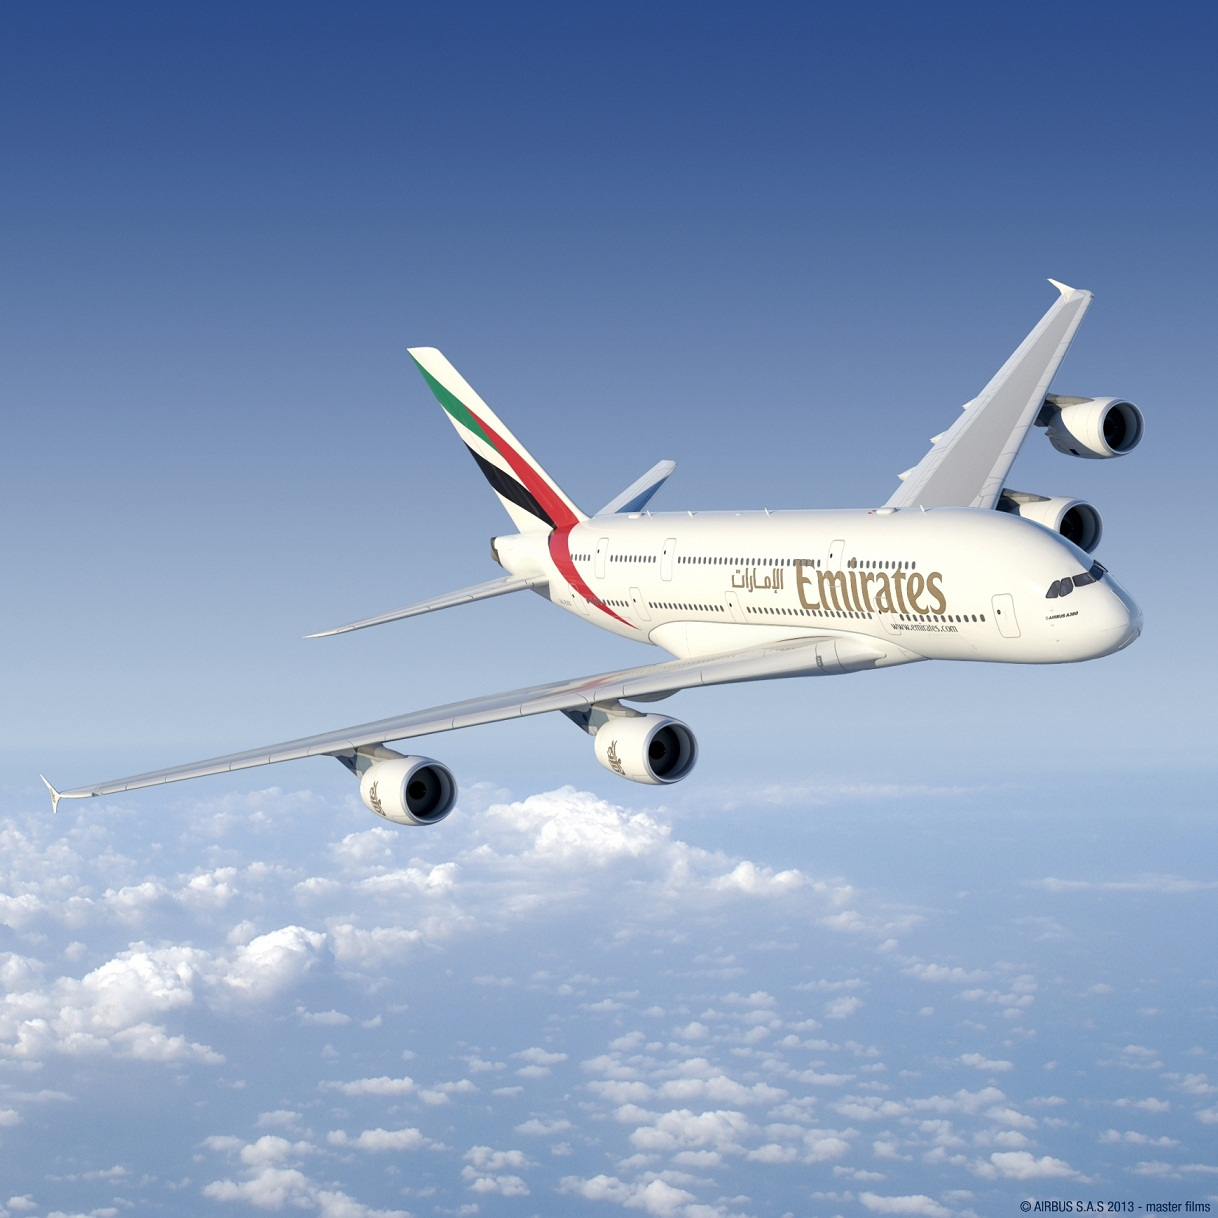 http://highend-traveller.com/emirates-extends-baggage-allowance-to-dubai-shopping-festival-shoppers/